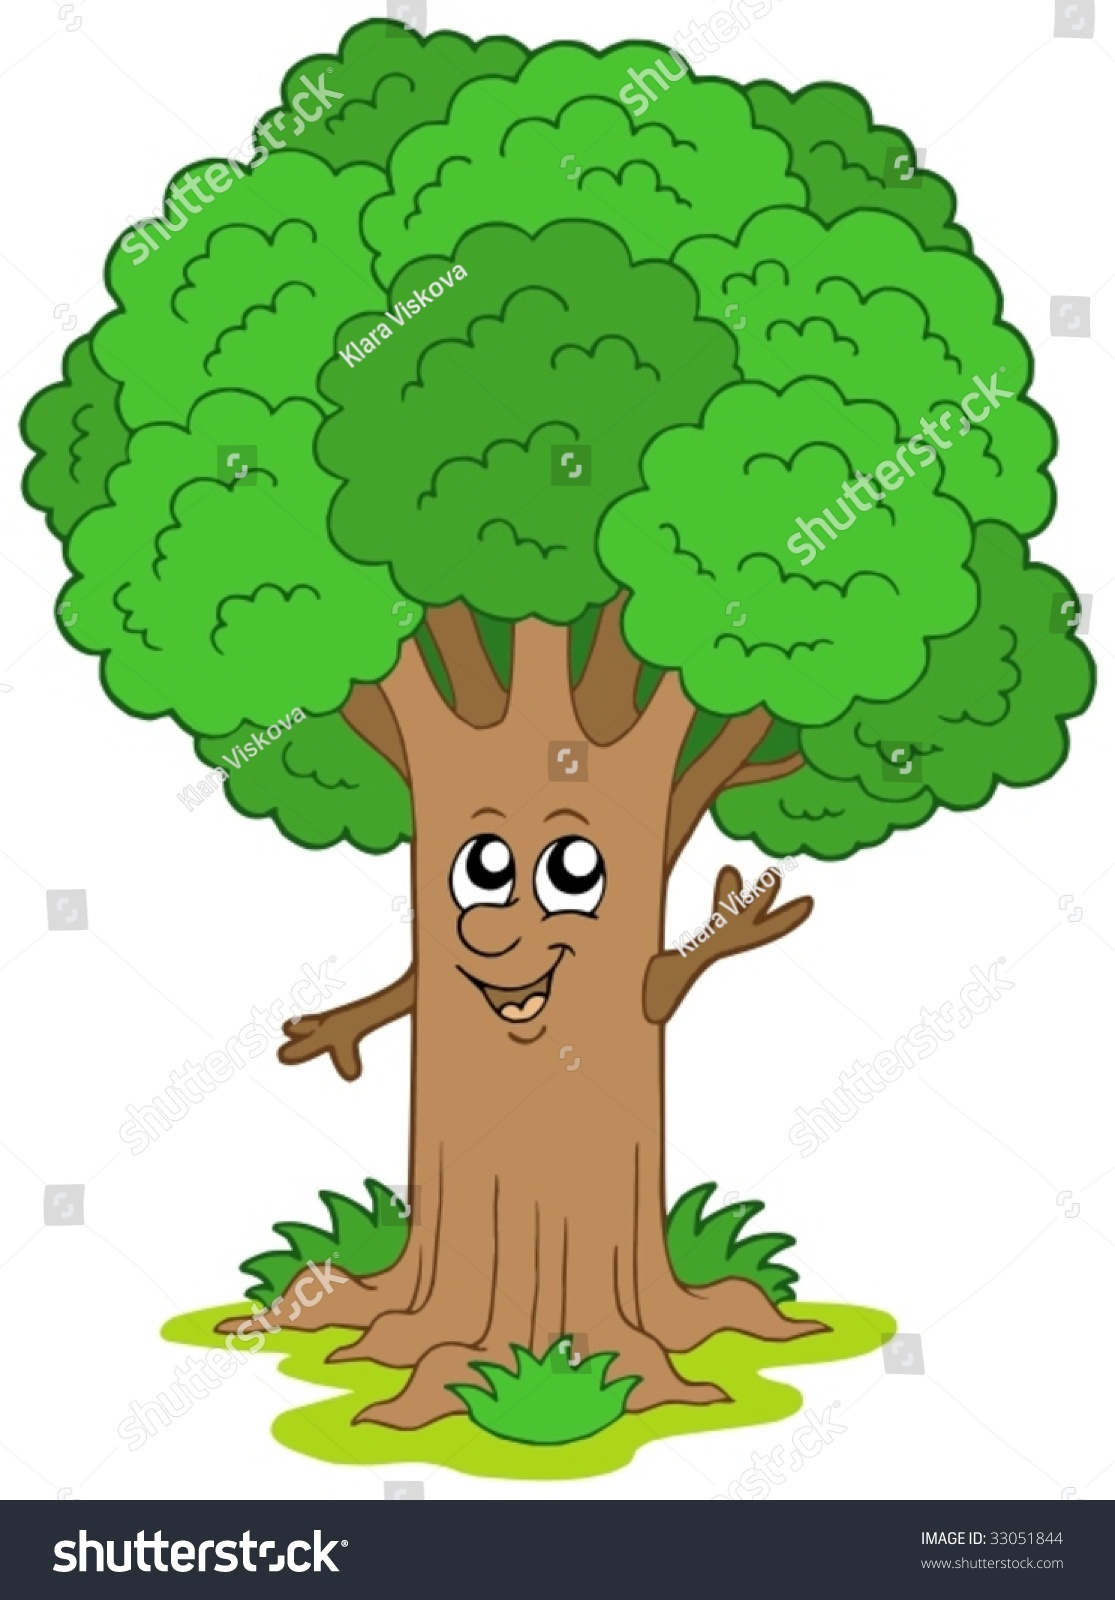 Cute Cartoon Trees With Faces cartoon tree character - vector ...